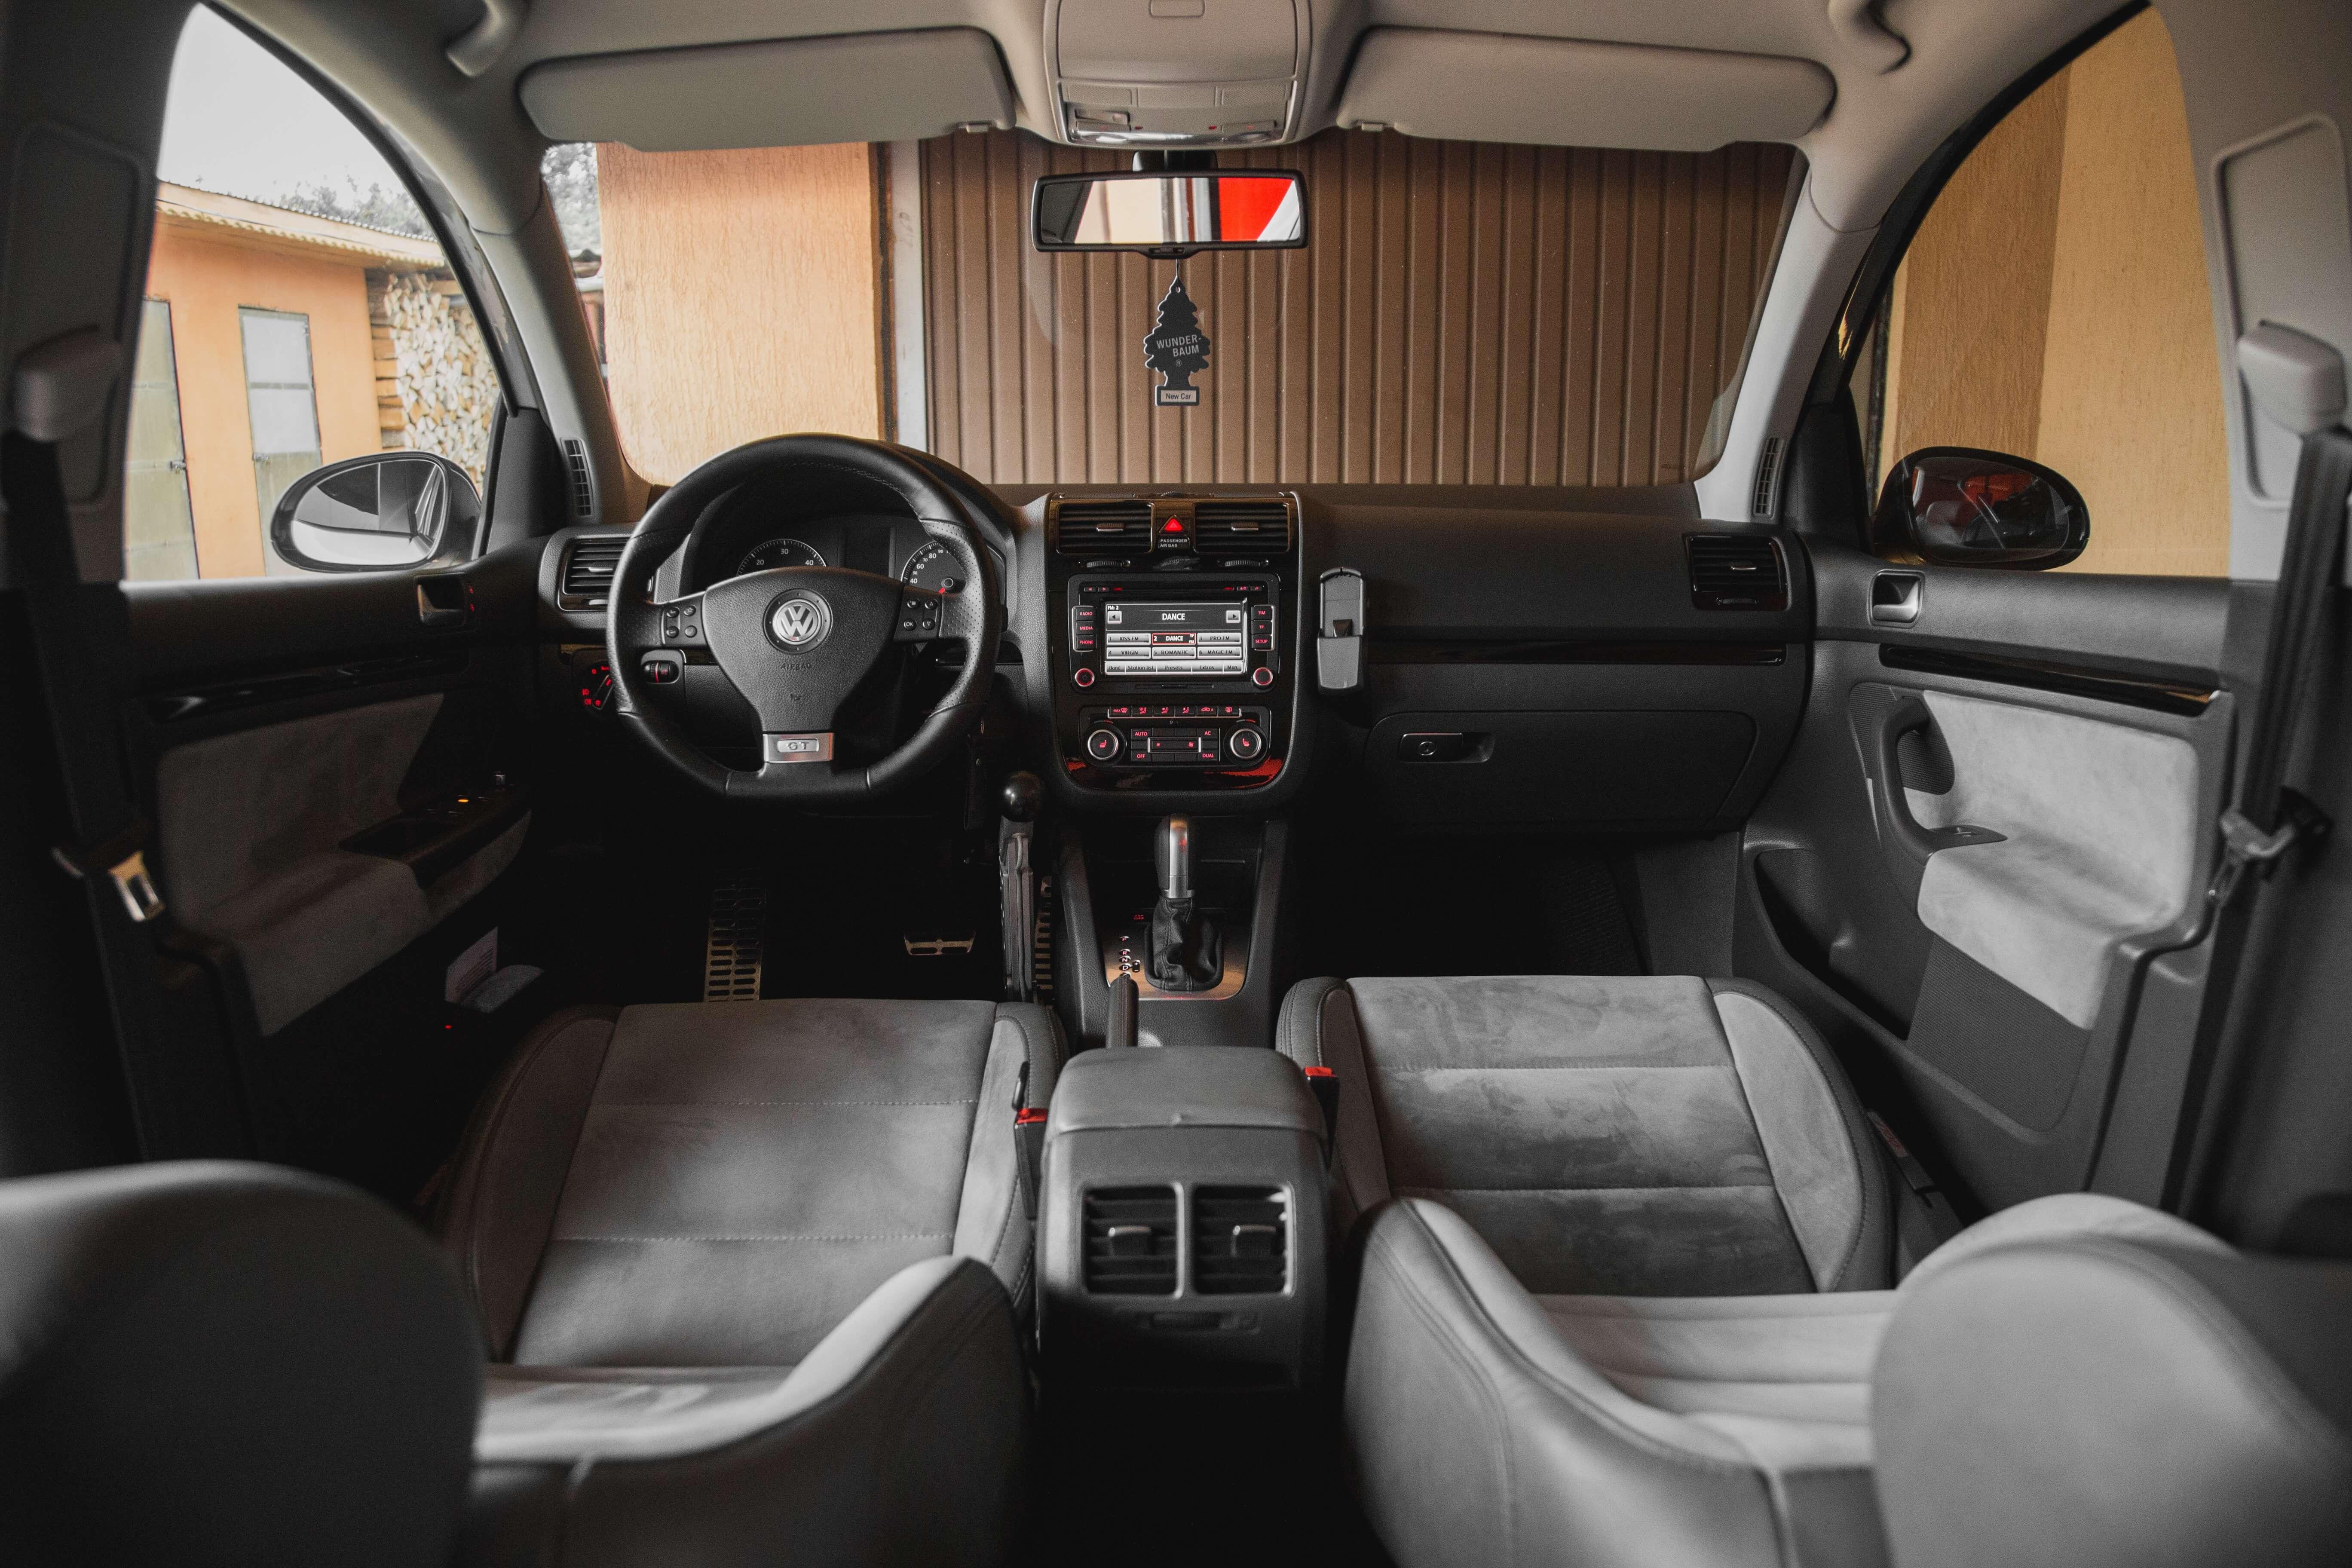 ledersthle reinigen latest ledersitze im auto reinigen with ledersthle reinigen ratgeber. Black Bedroom Furniture Sets. Home Design Ideas